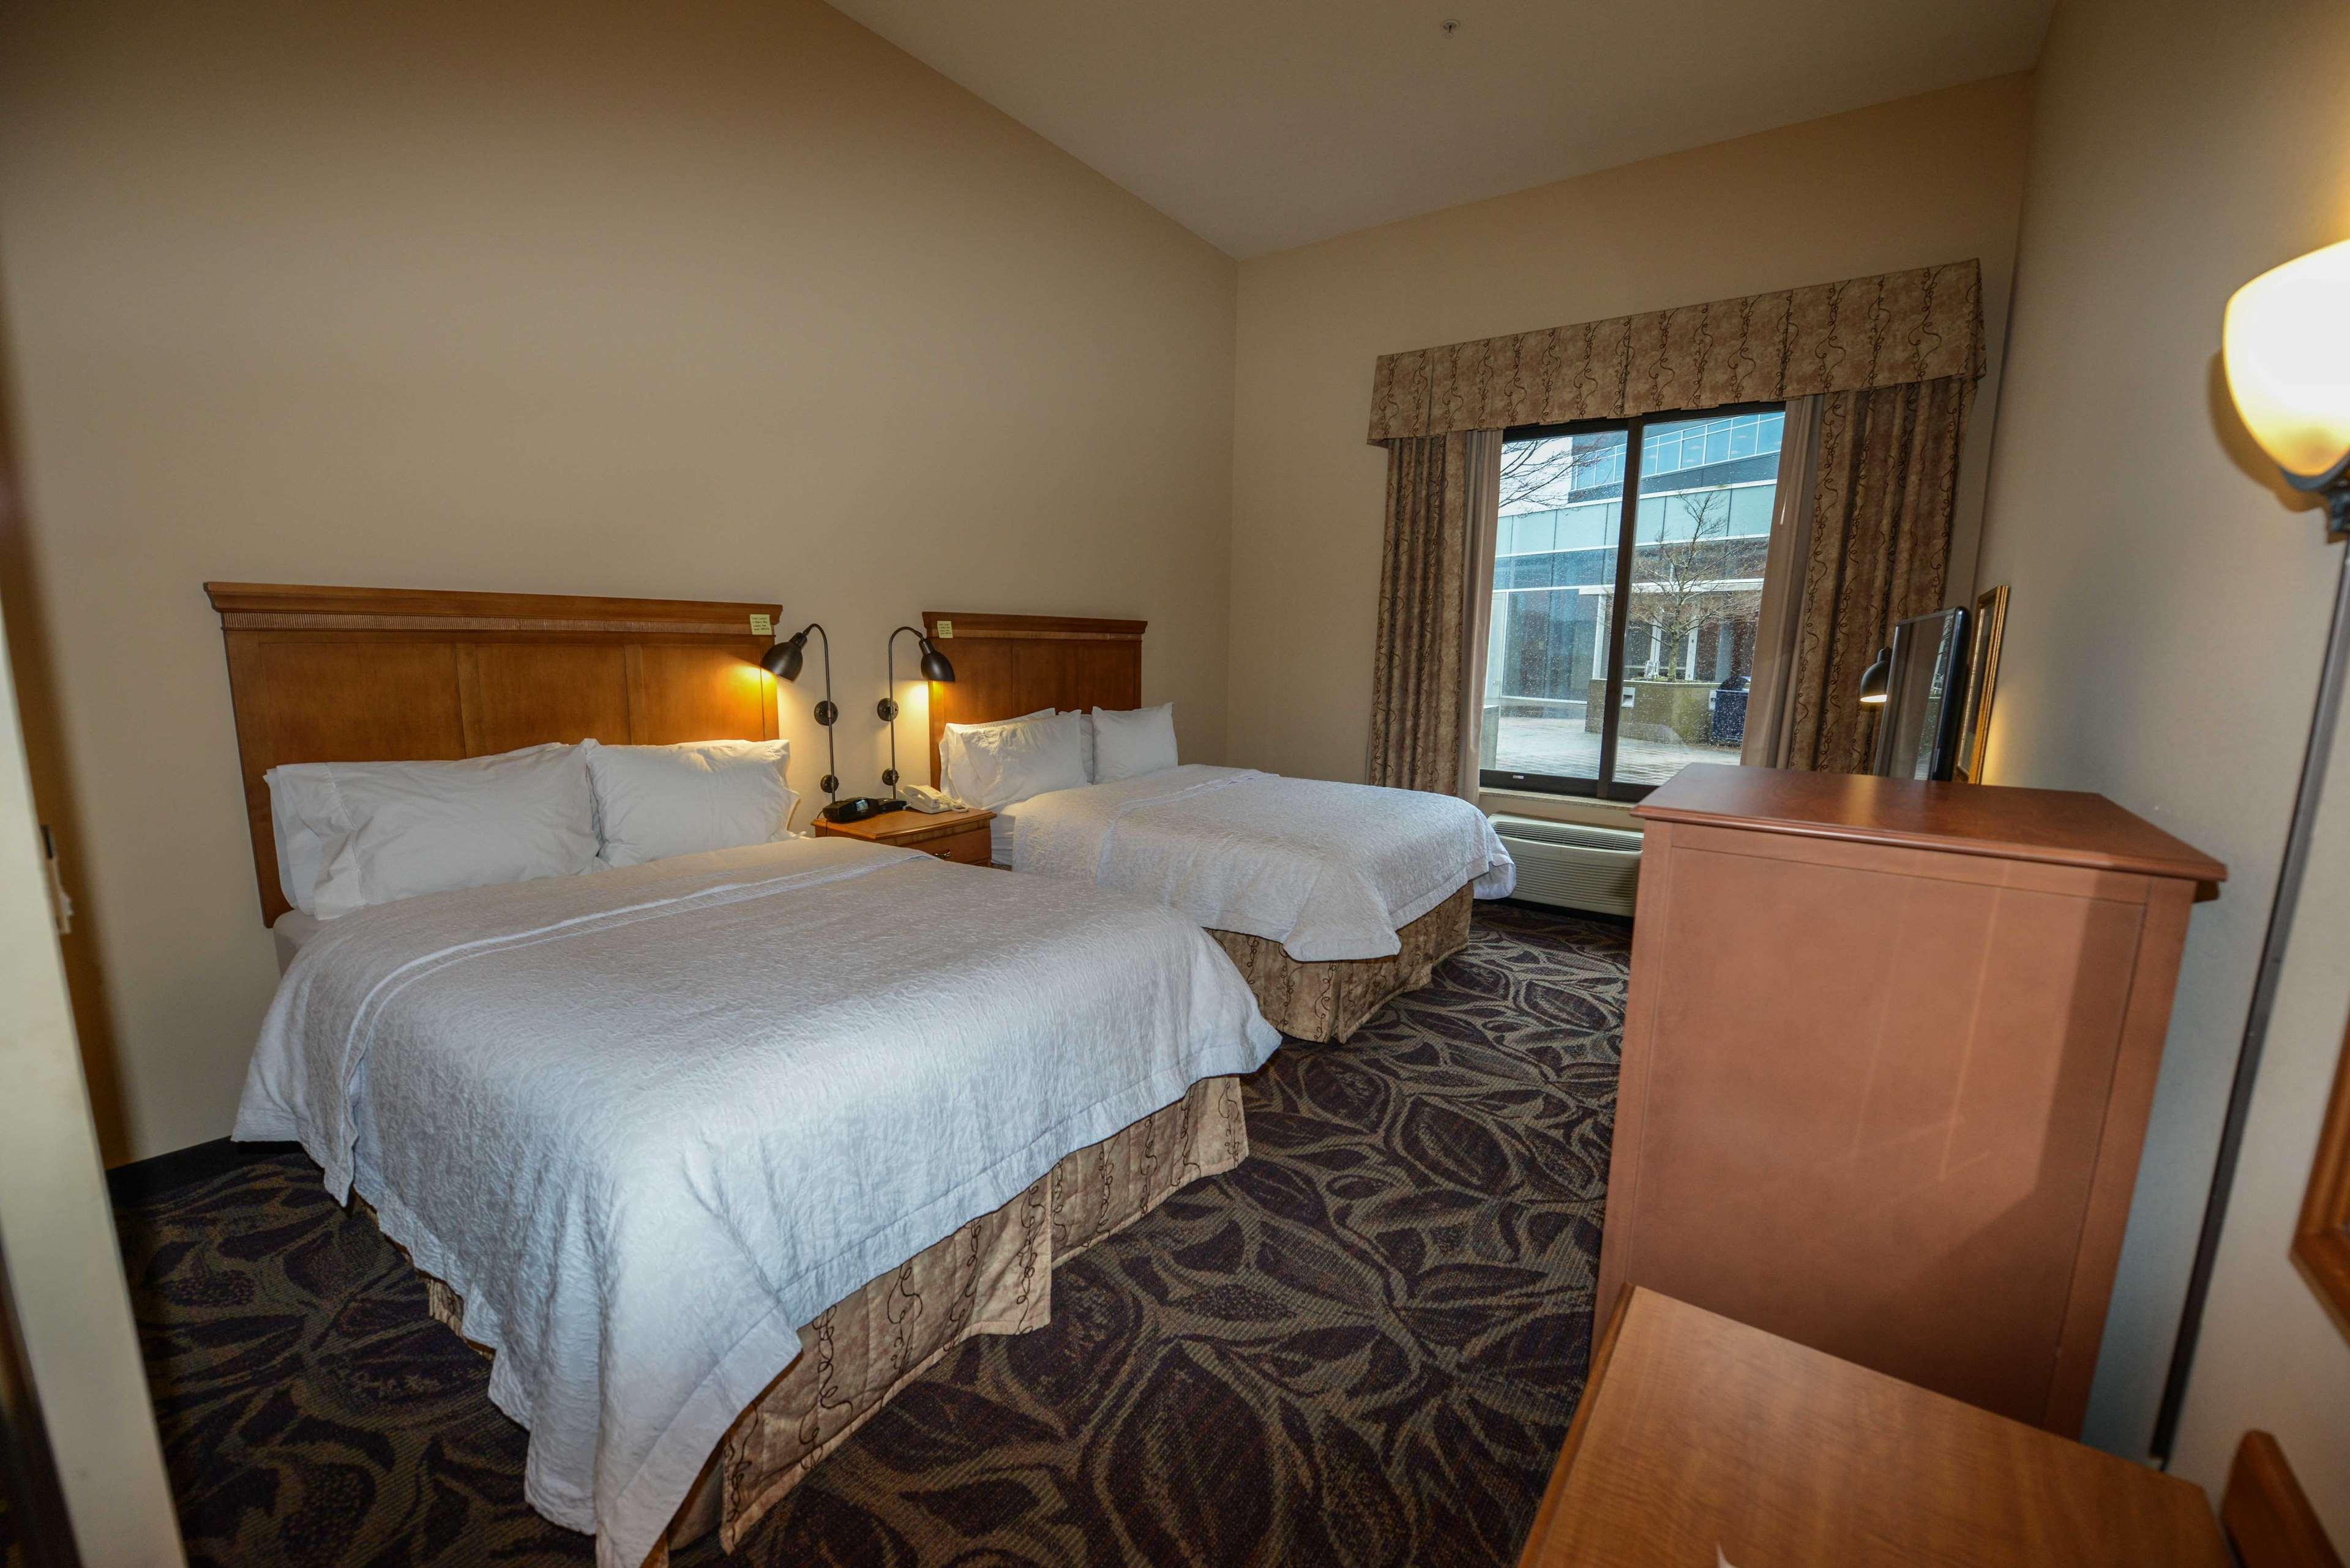 Hampton Inn & Suites Bremerton image 45